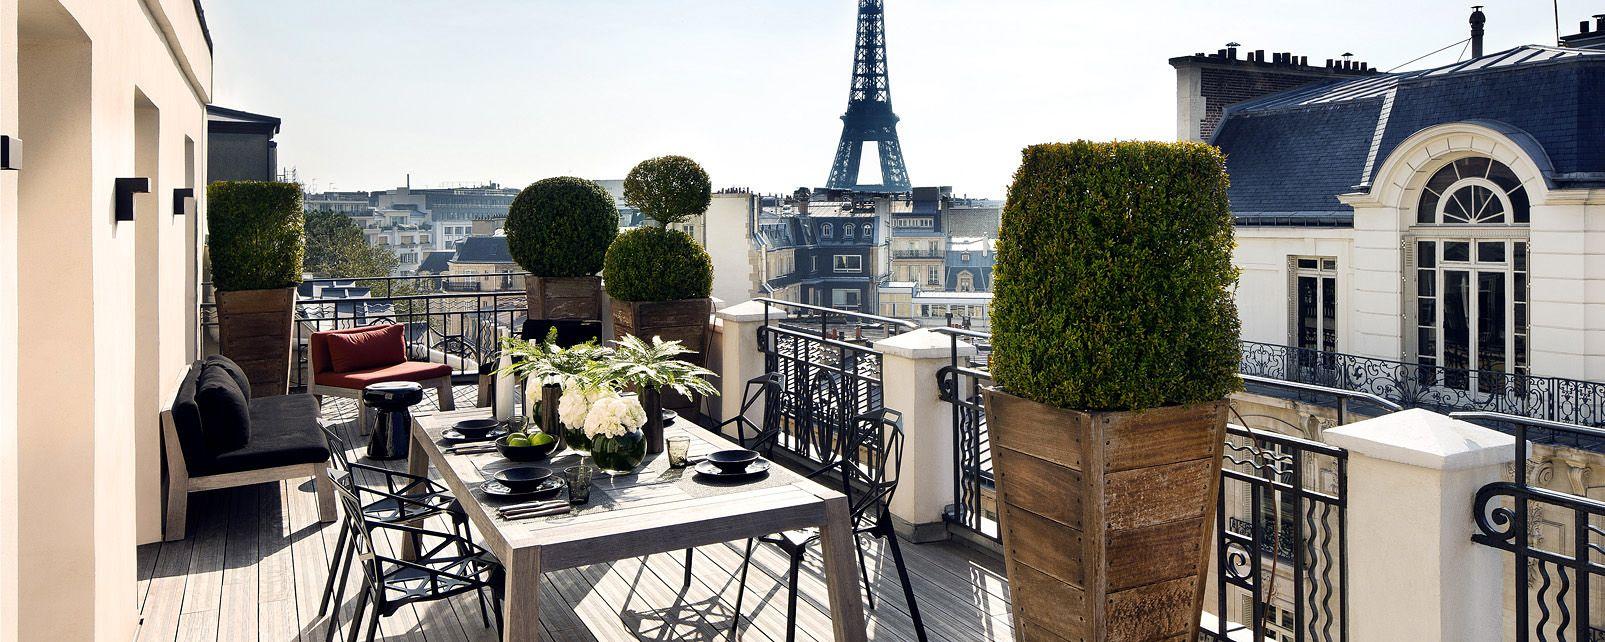 Hotel Marignan Champs Elysées